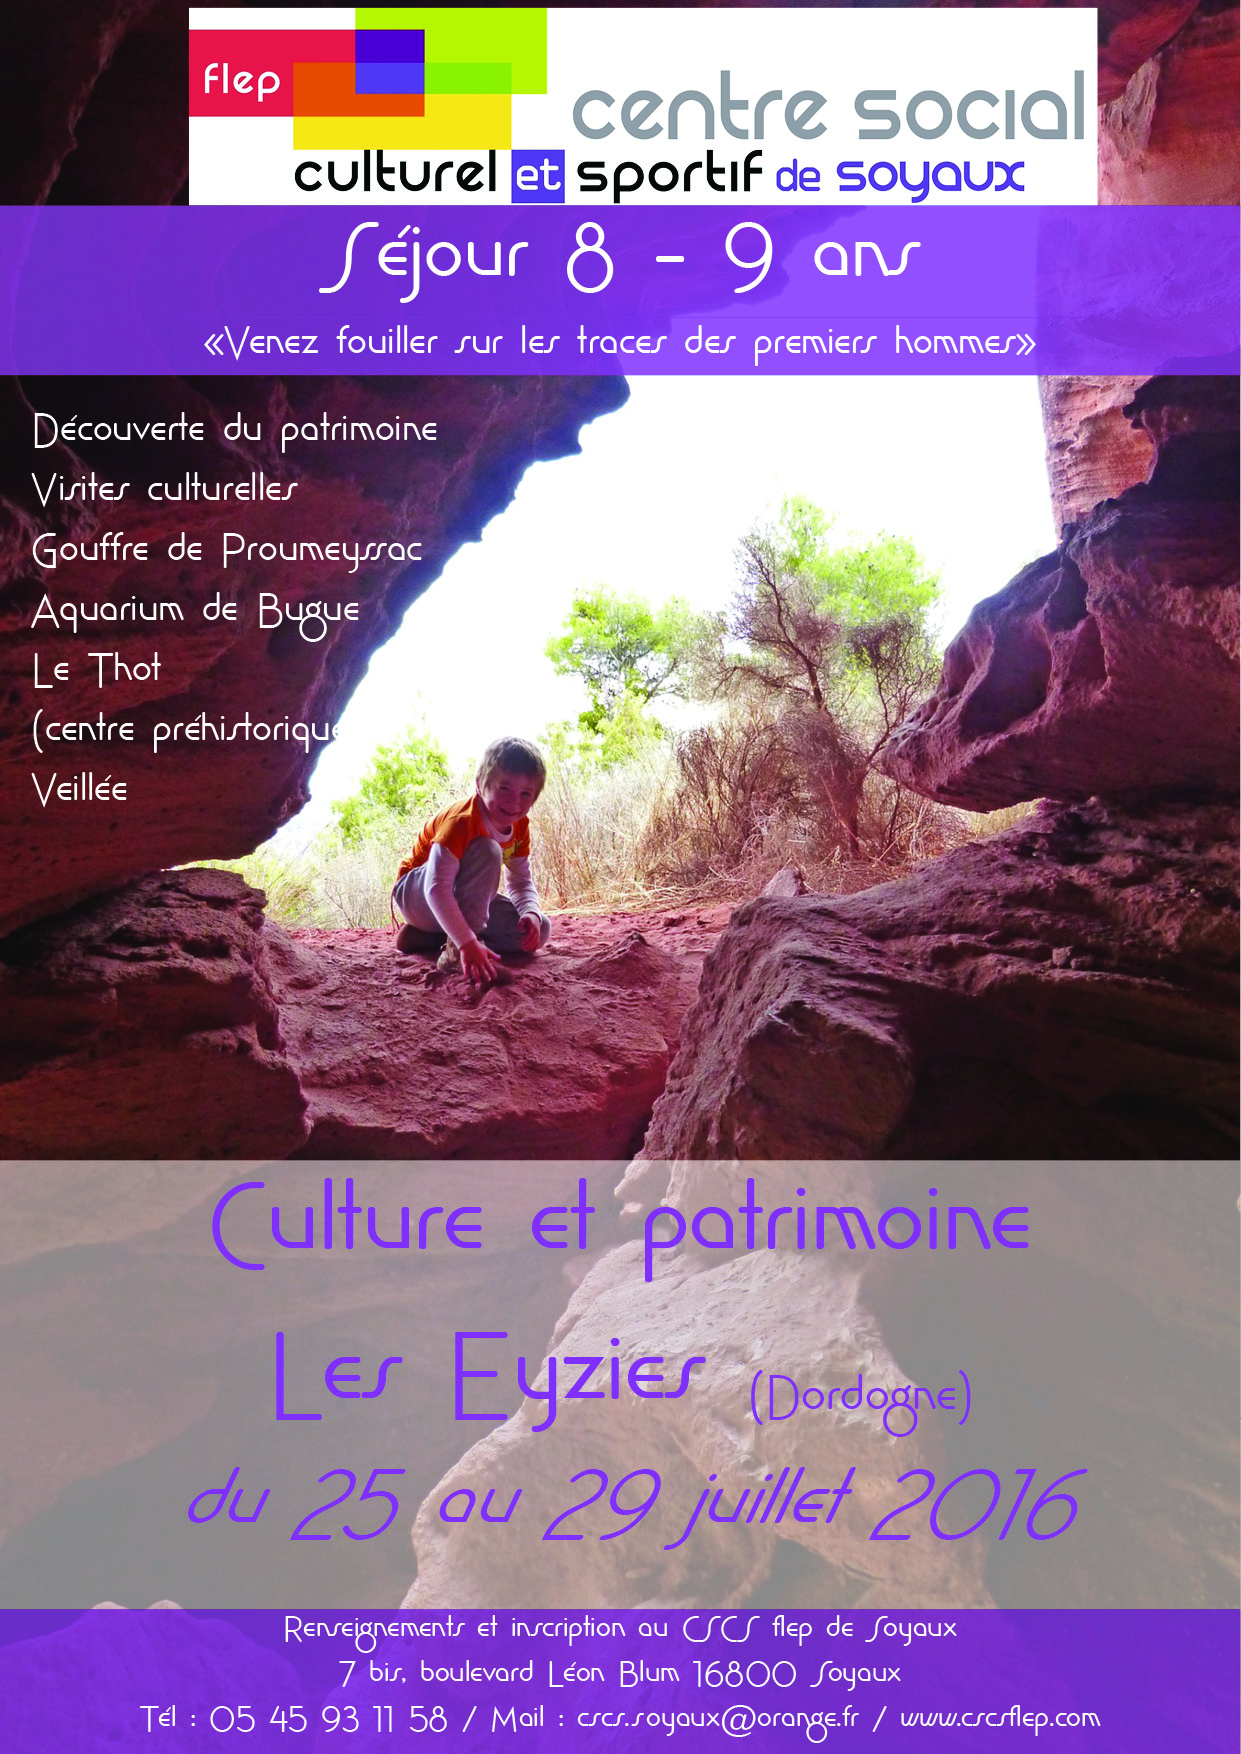 culture patrimoine 8-9